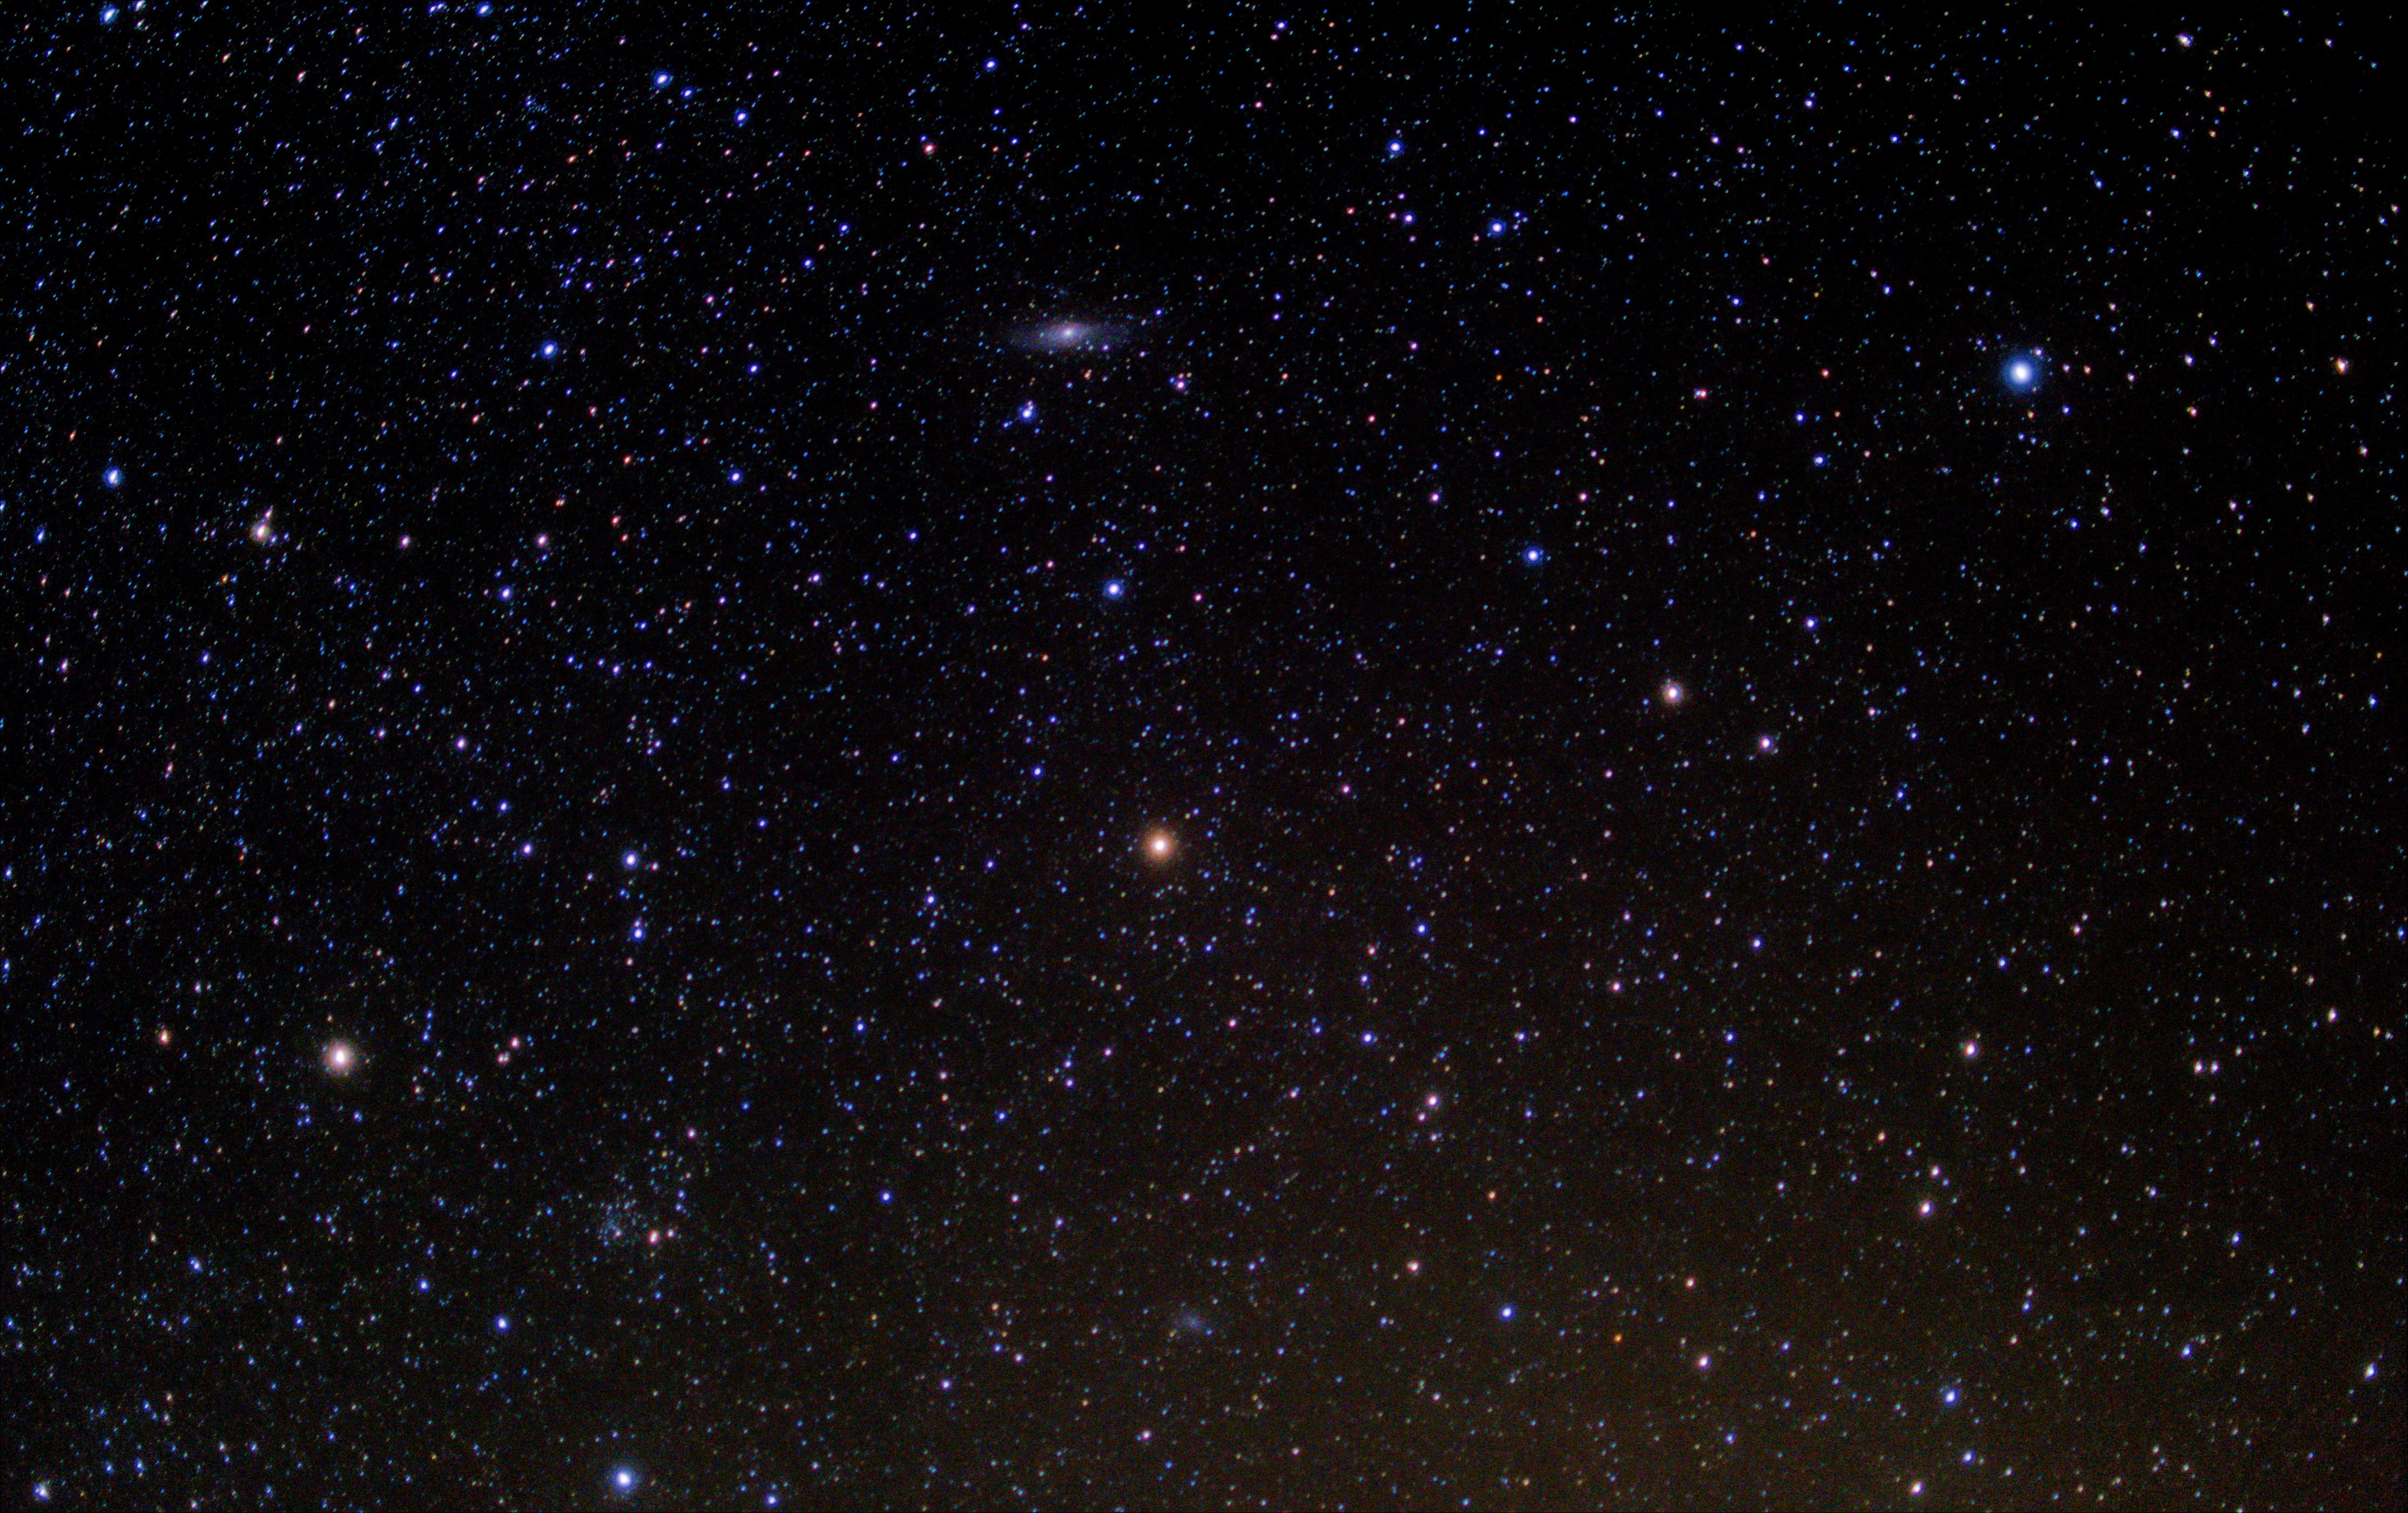 Starry sky at night, Starry sky at night